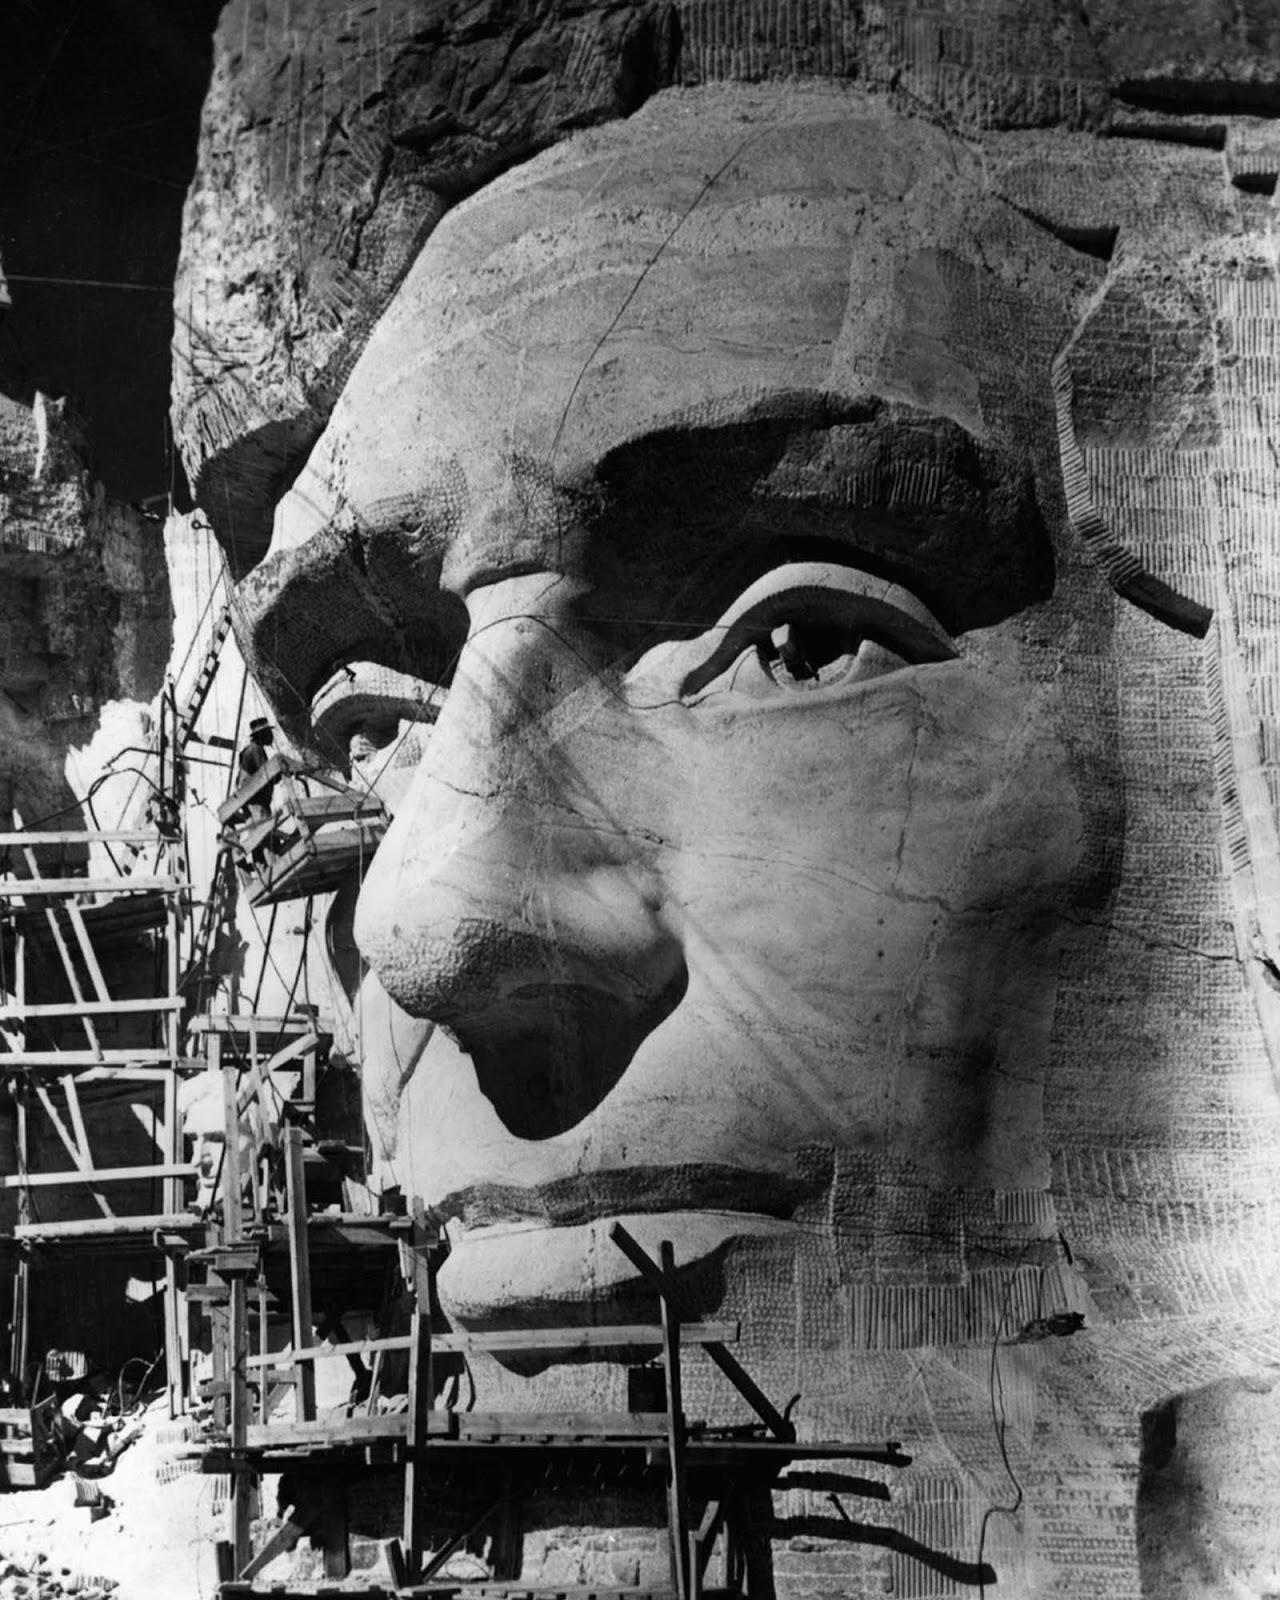 Borglum works on Abraham Lincoln's eye. 1937.